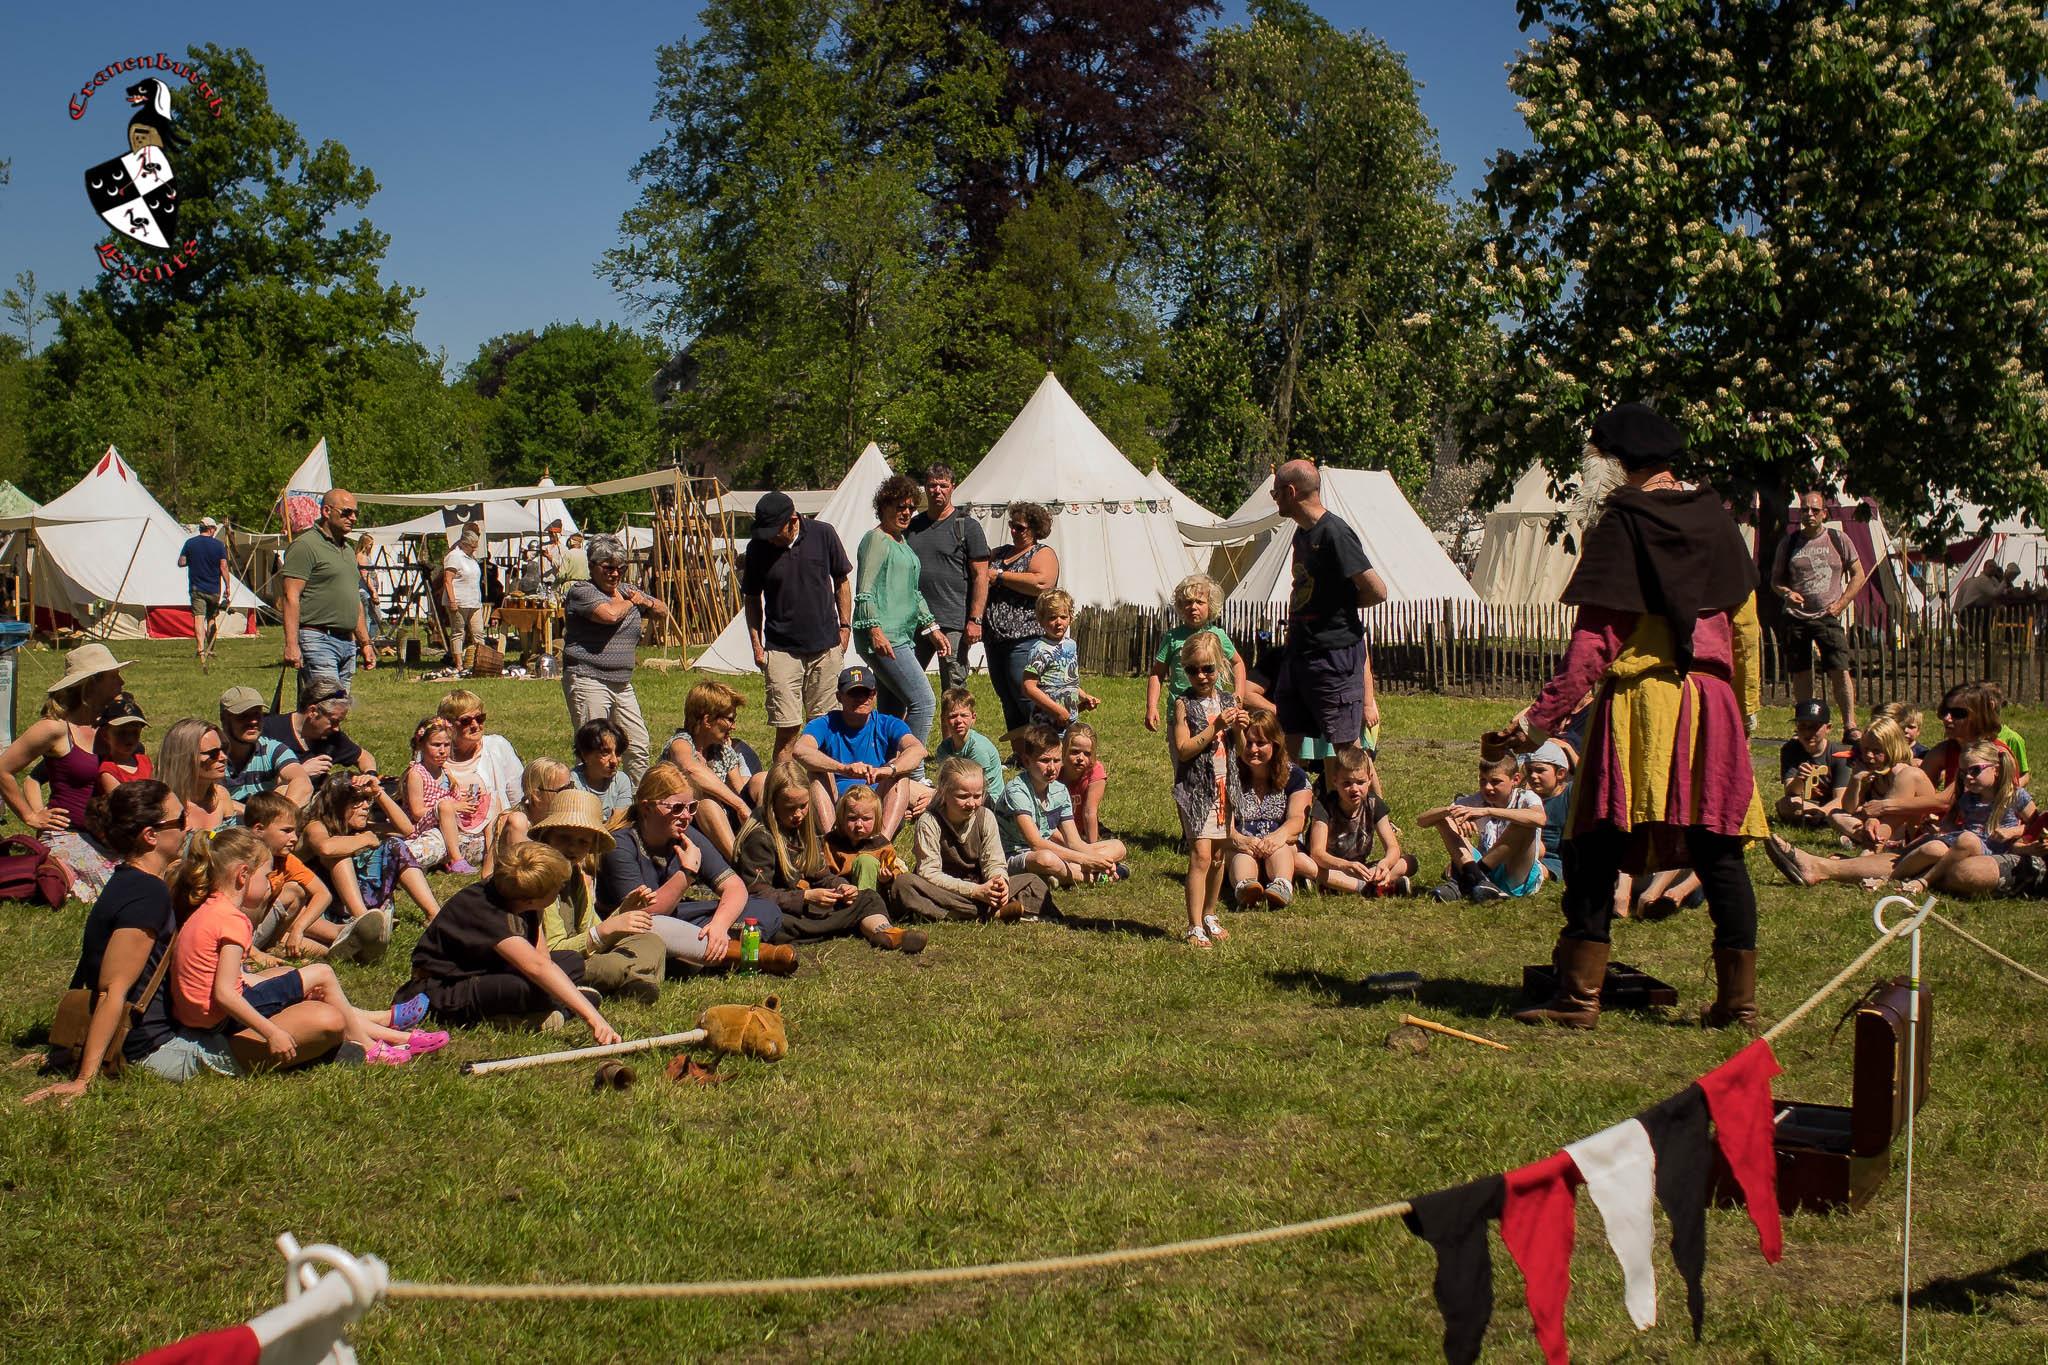 Middeleeuws-Festijn-Cannenburgh-2018-Algemeen-Ellen-la-Faille-30